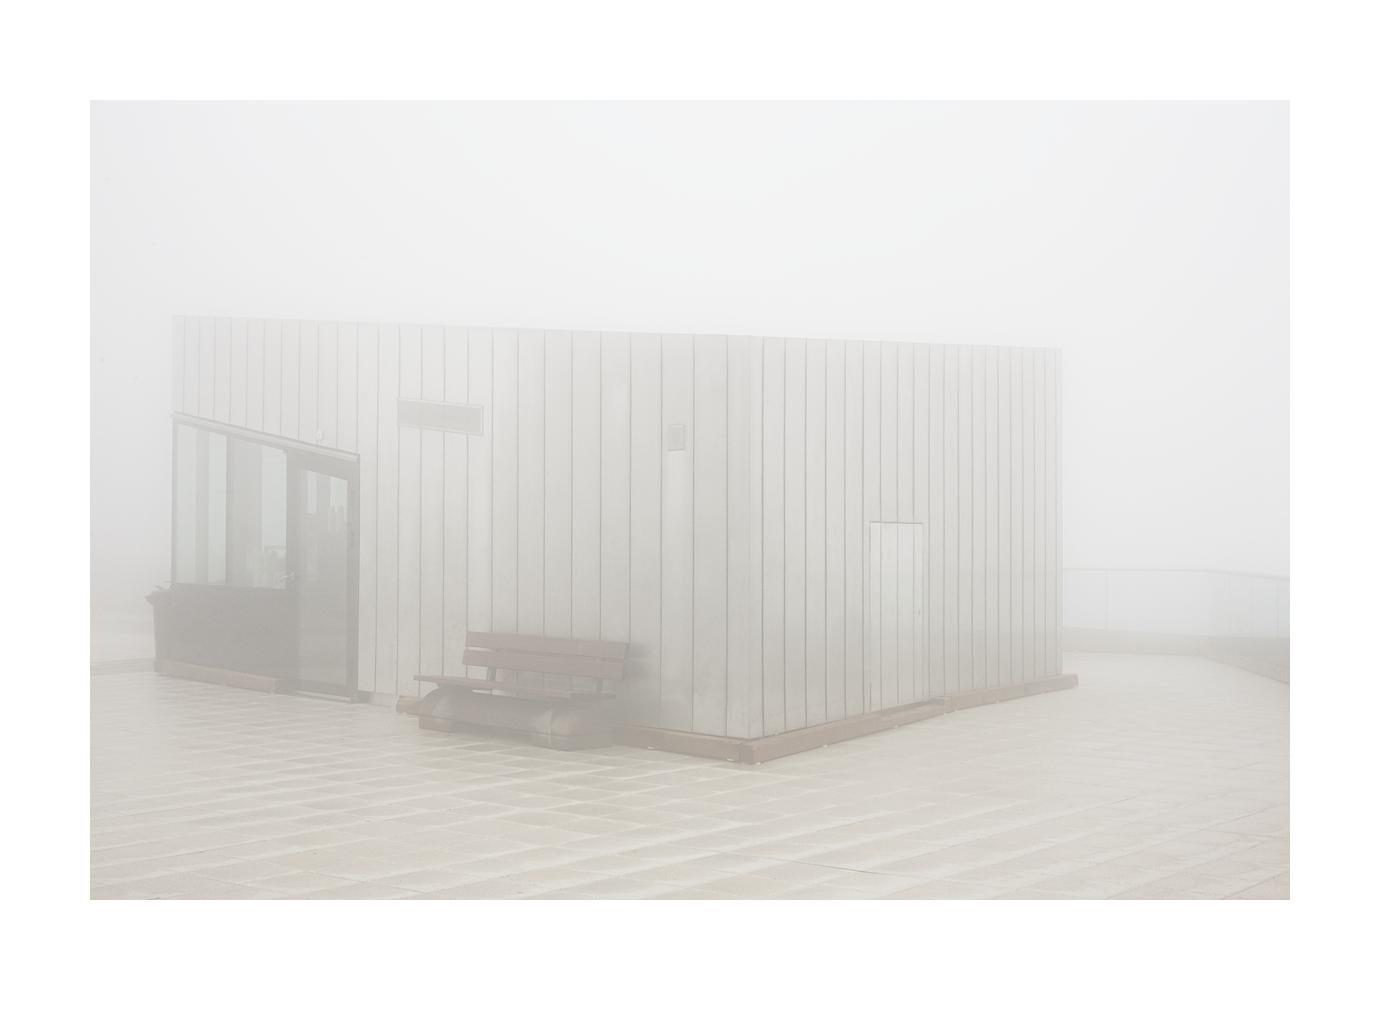 Hintergrundbilder : Weiß, Tabelle, Holz, Nebel, grau, Regal ...